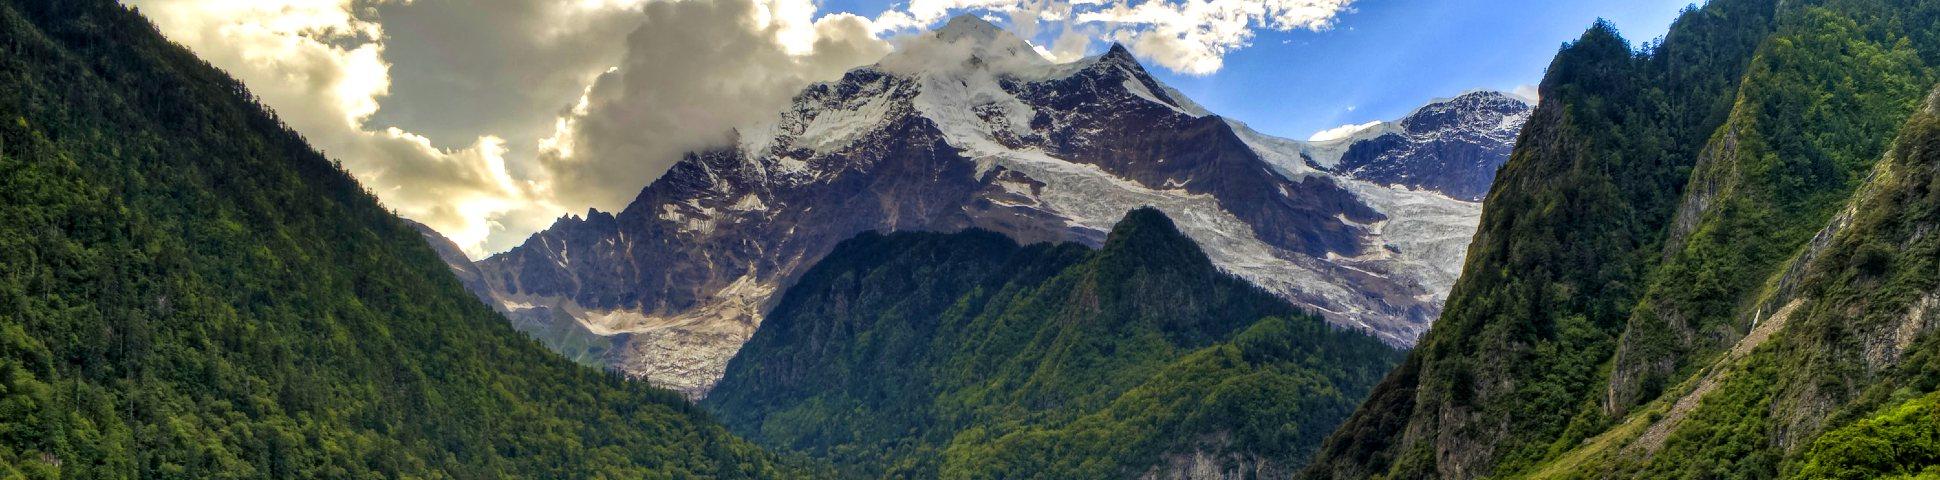 Panoramic view from Yunnan